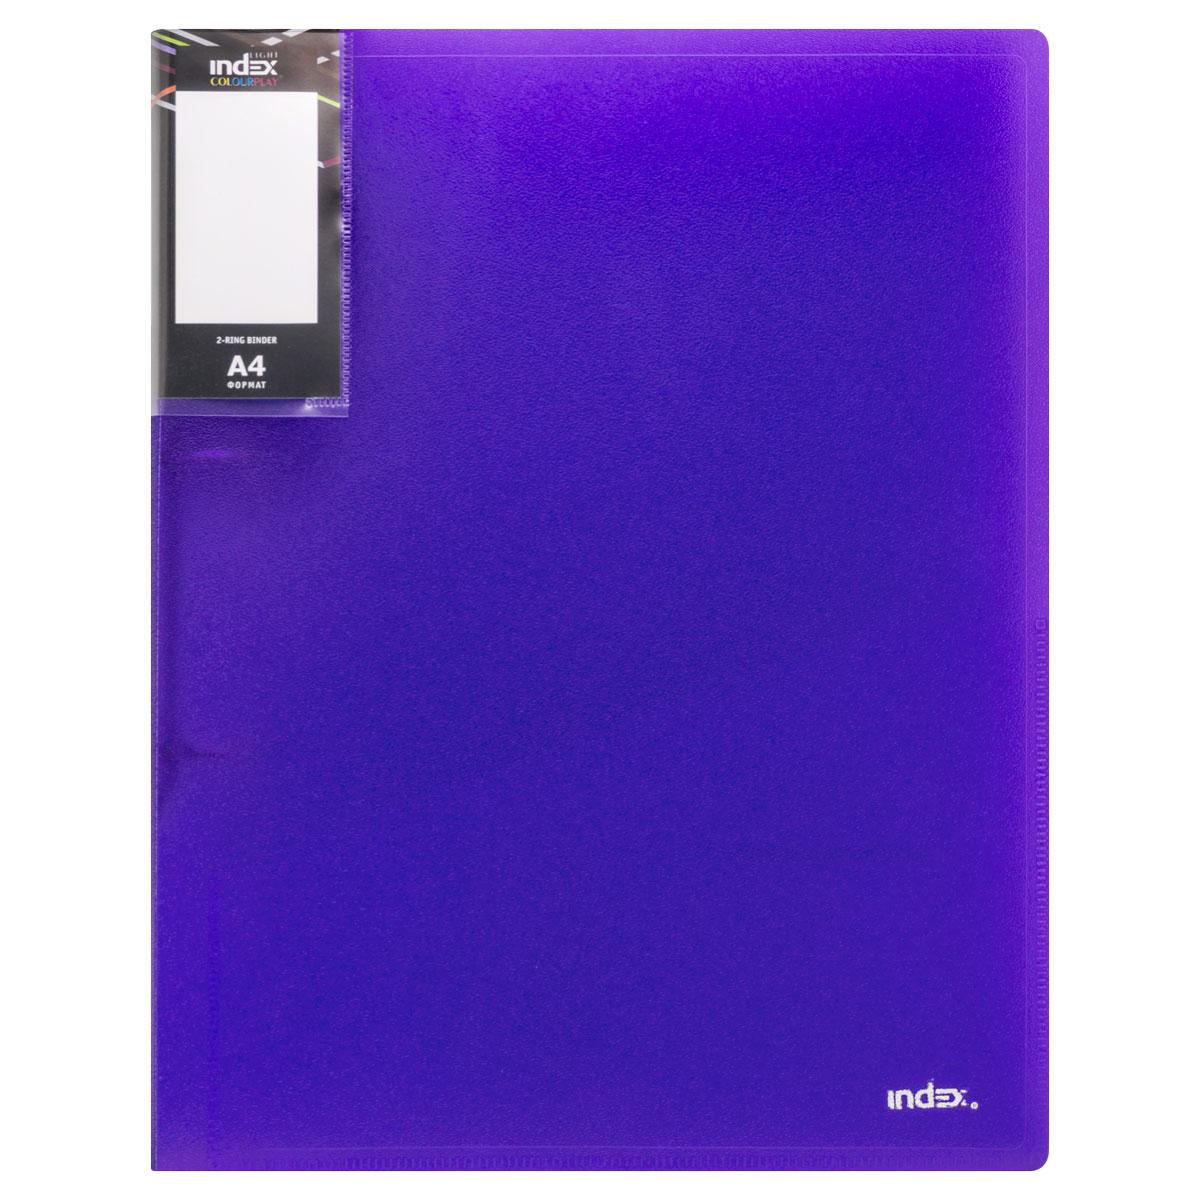 Папка на 2 кольцах Index Colourplay Light, A4, 0.6 мм, Прозрачная/Фиолетовая